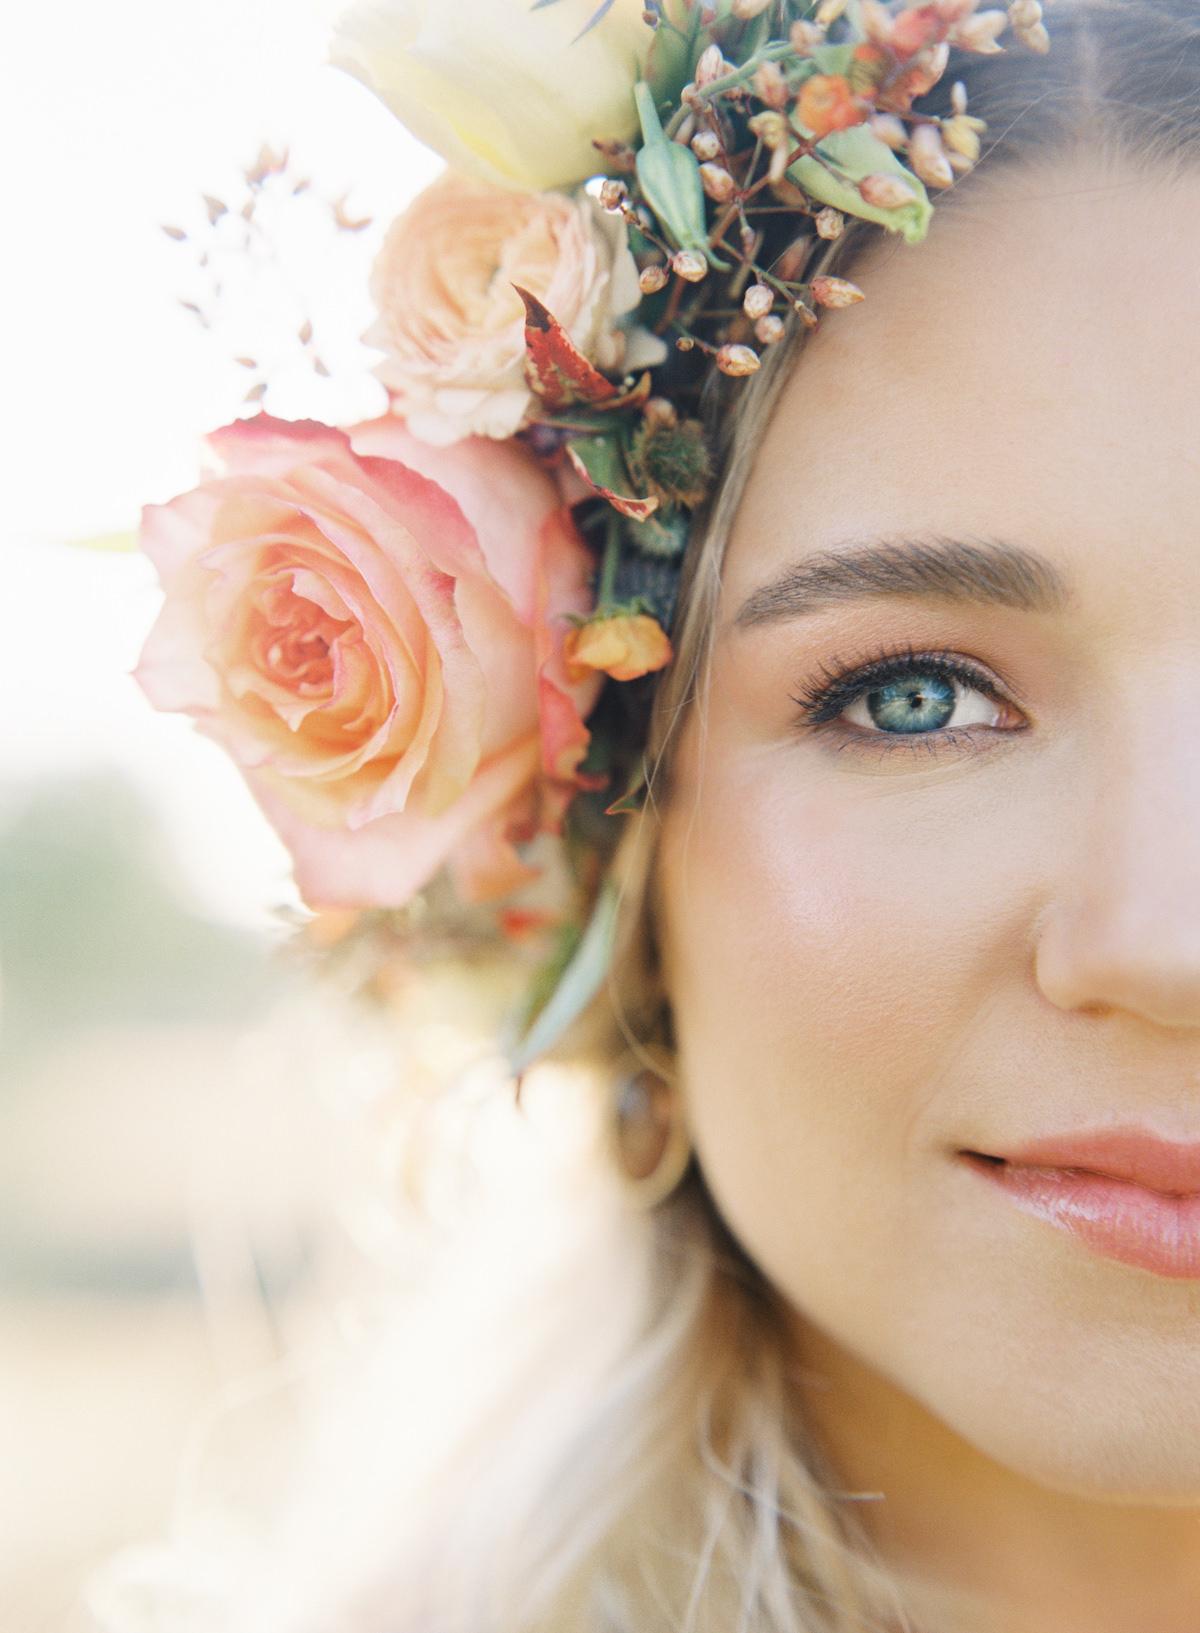 Santa-Barbara-Film-Wedding-Photography-San-Luis-Obispo-Ashley-Rae-Studio114.jpg